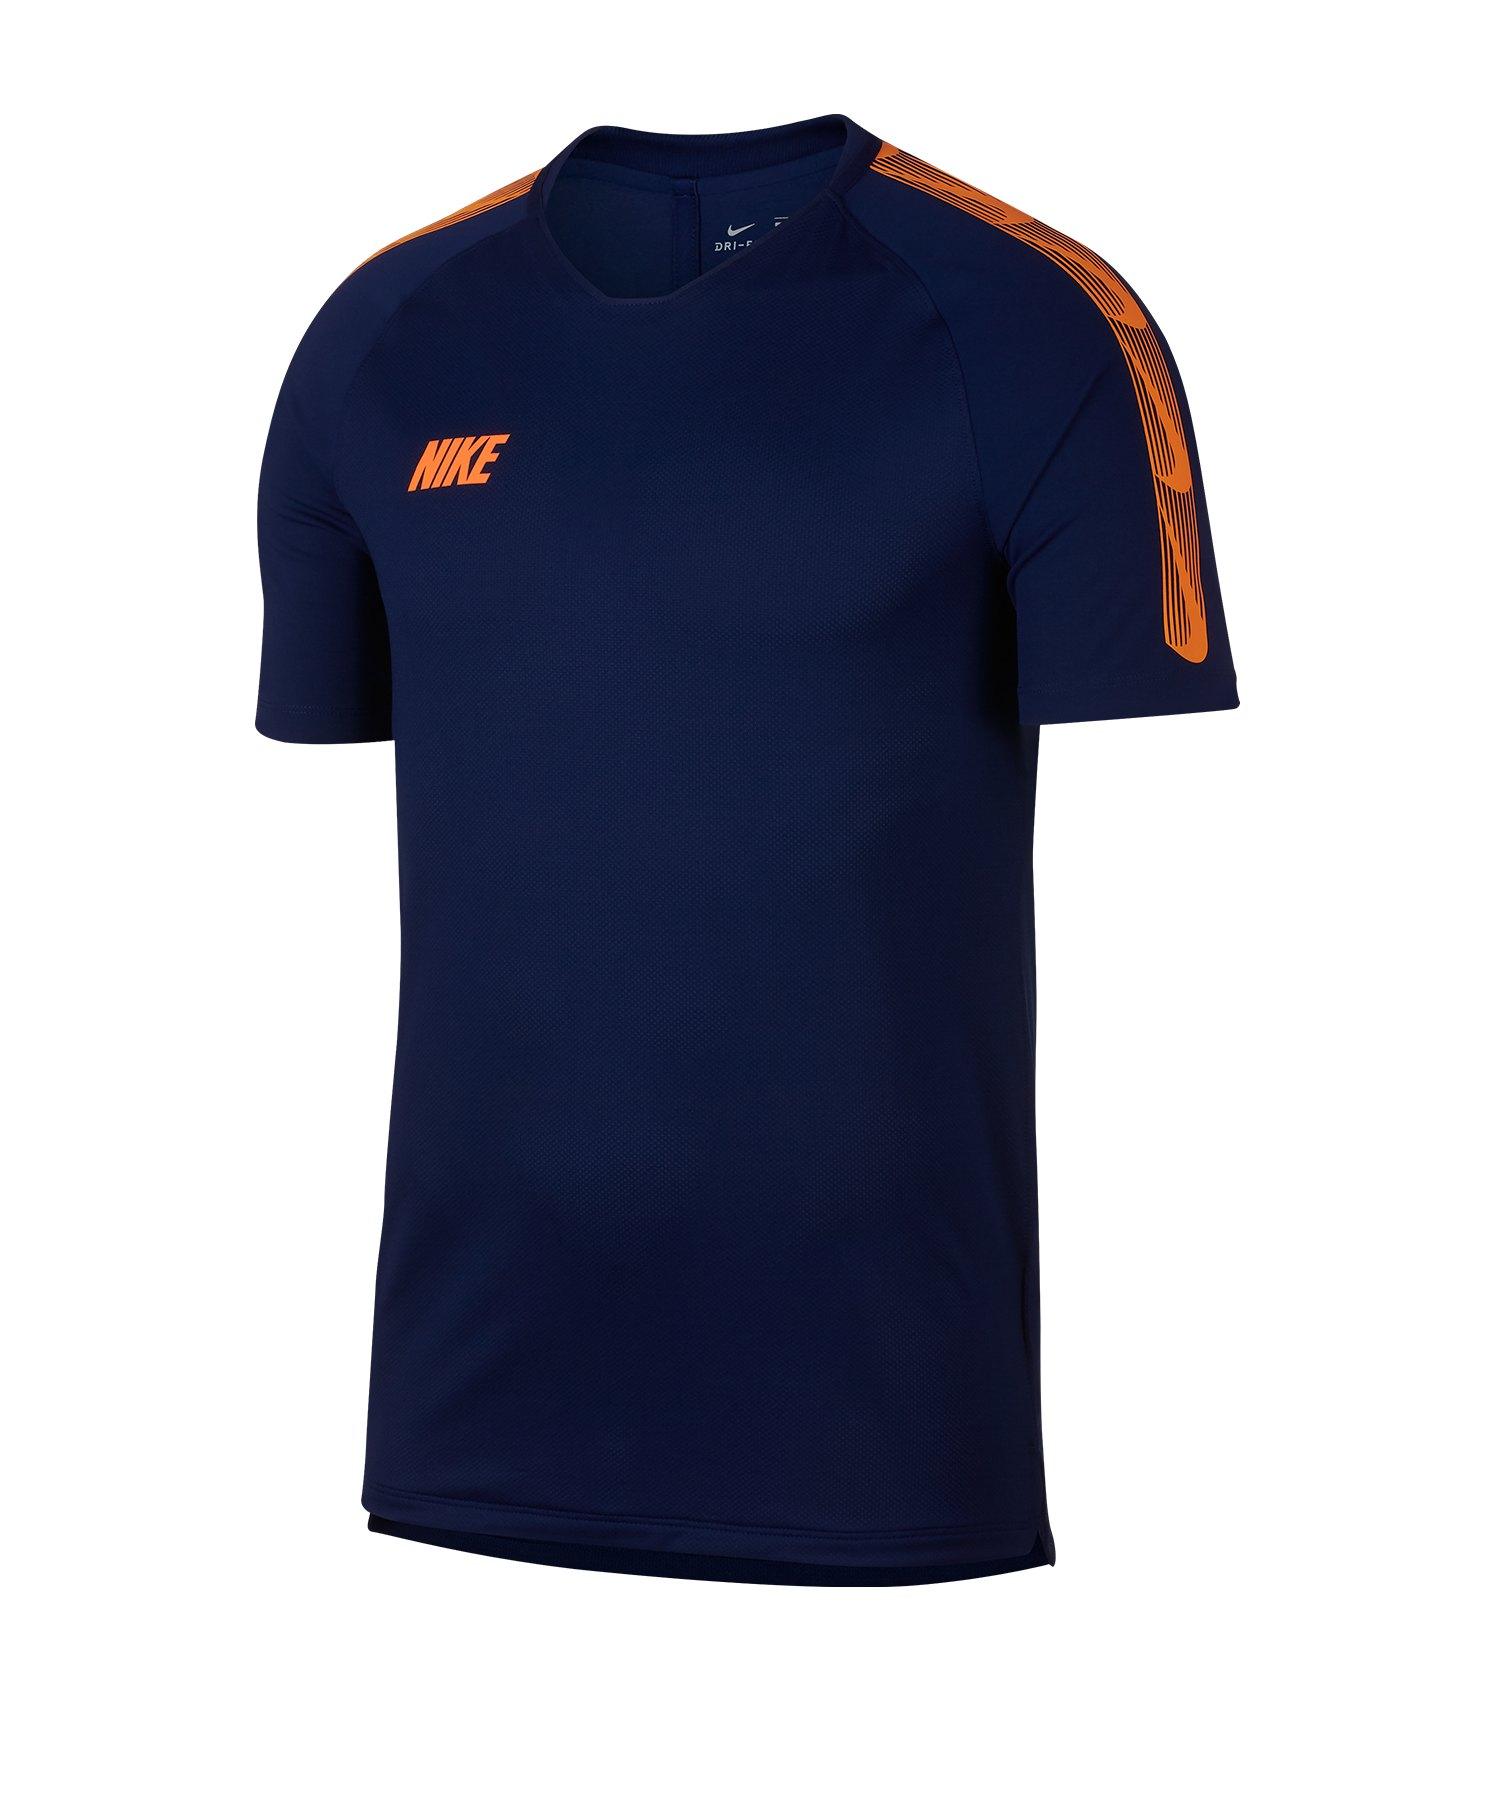 Nike Dry Squad Breathe T-Shirt Blau Orange F492 - Blau